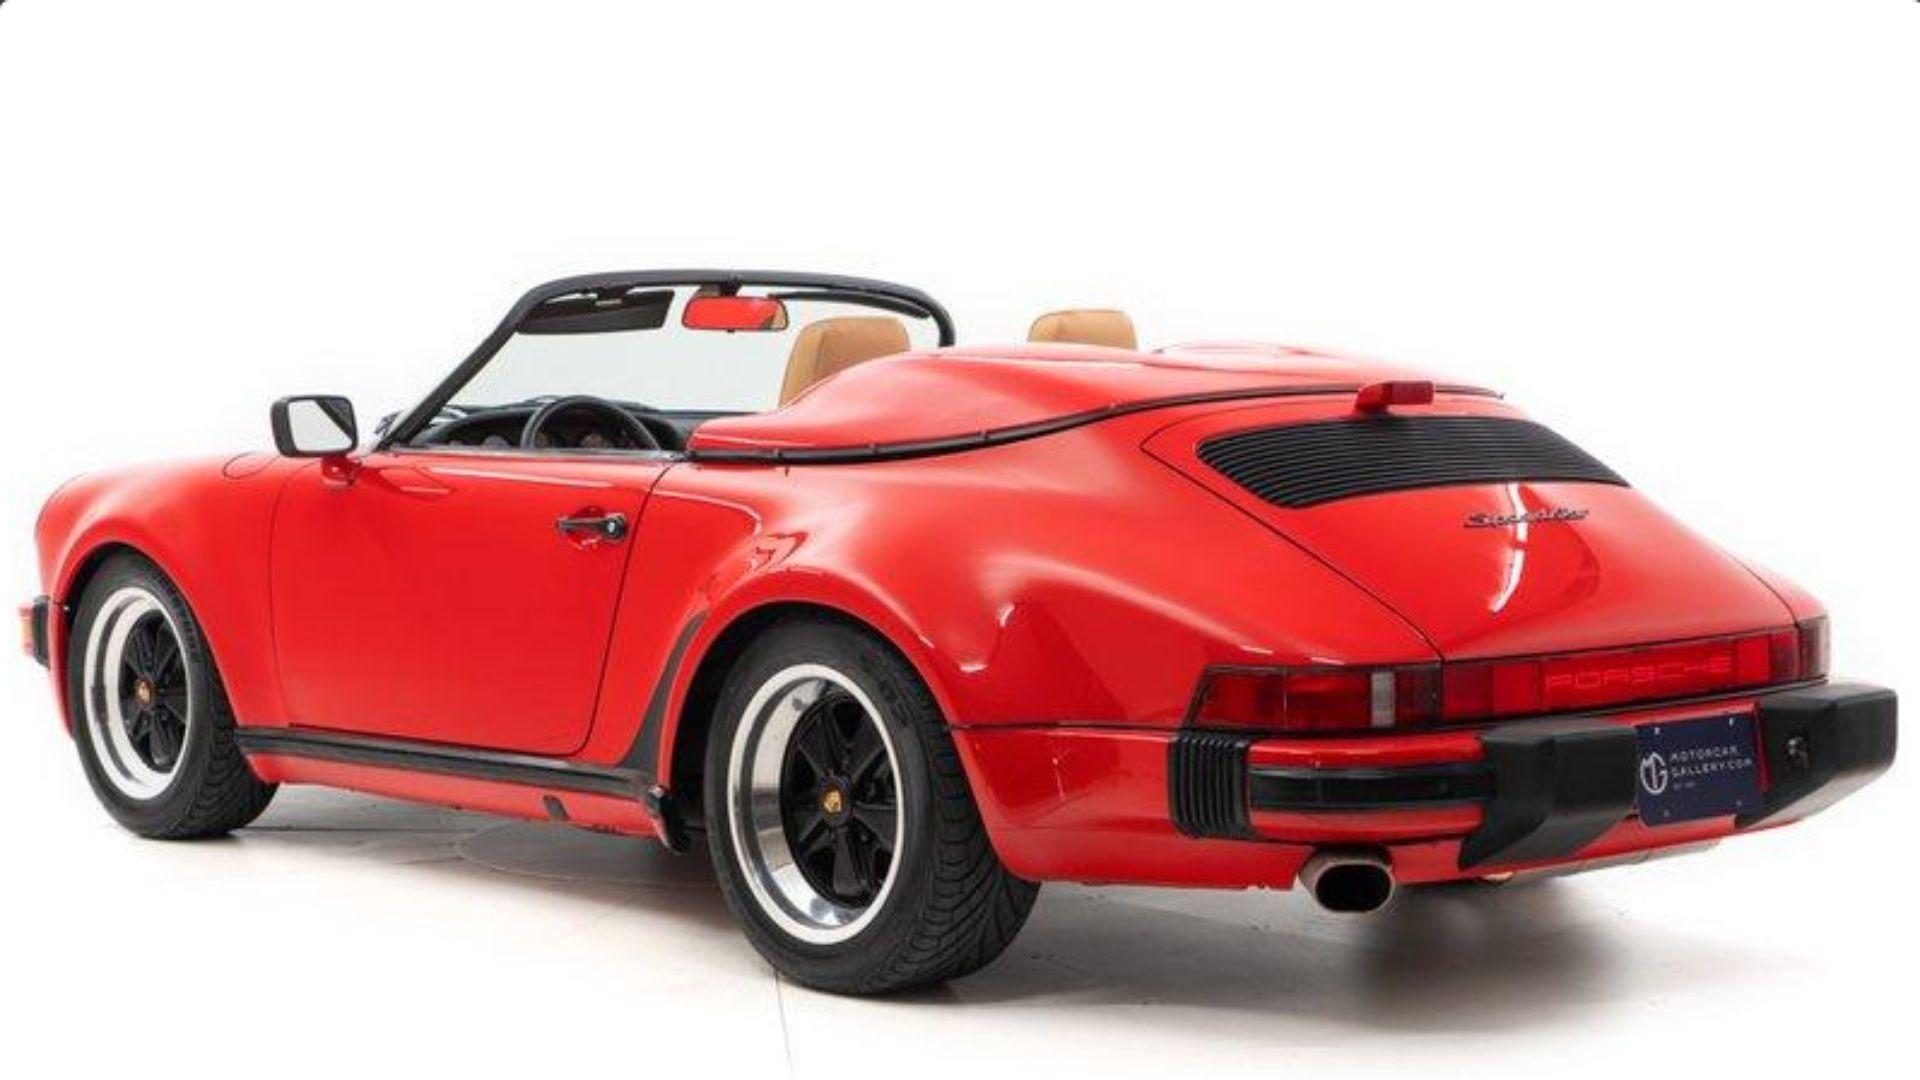 1989 Porsche 911 Speedster Crosses The Auction Block